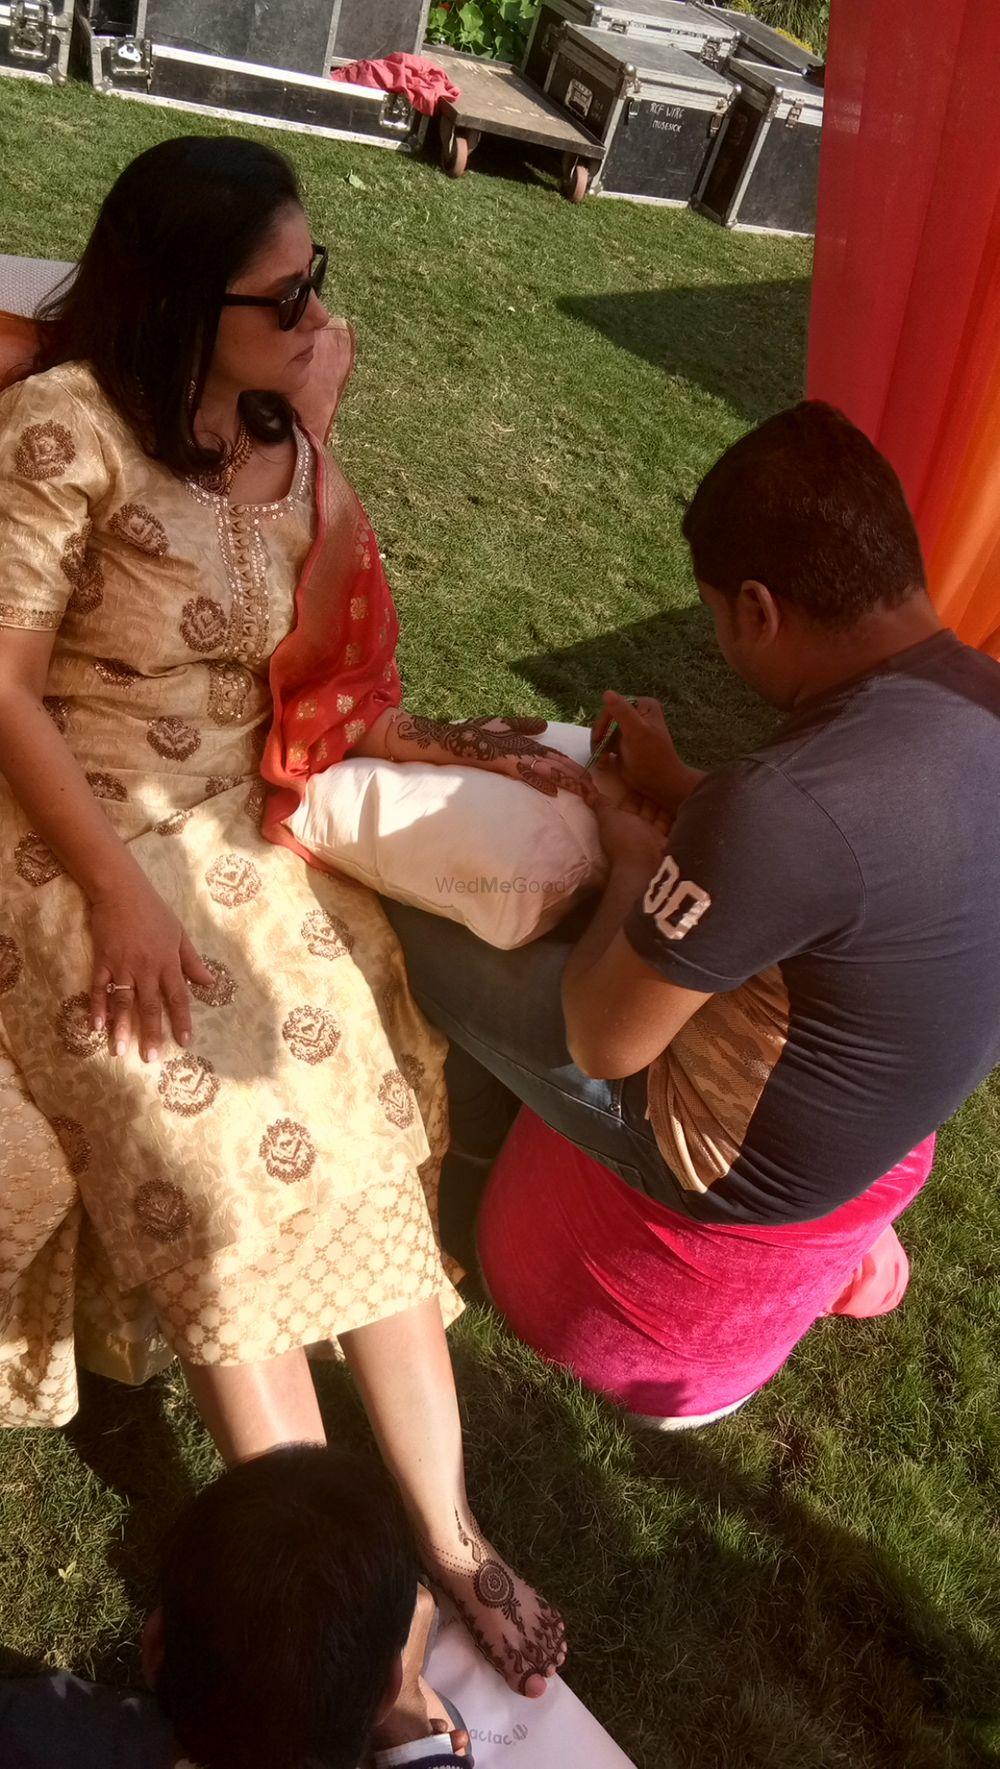 Photo From Swati puri bridal mehendi ceremony at Ananda greens at CHATTARPUR on 4th feb - By Shalini Mehendi Artist